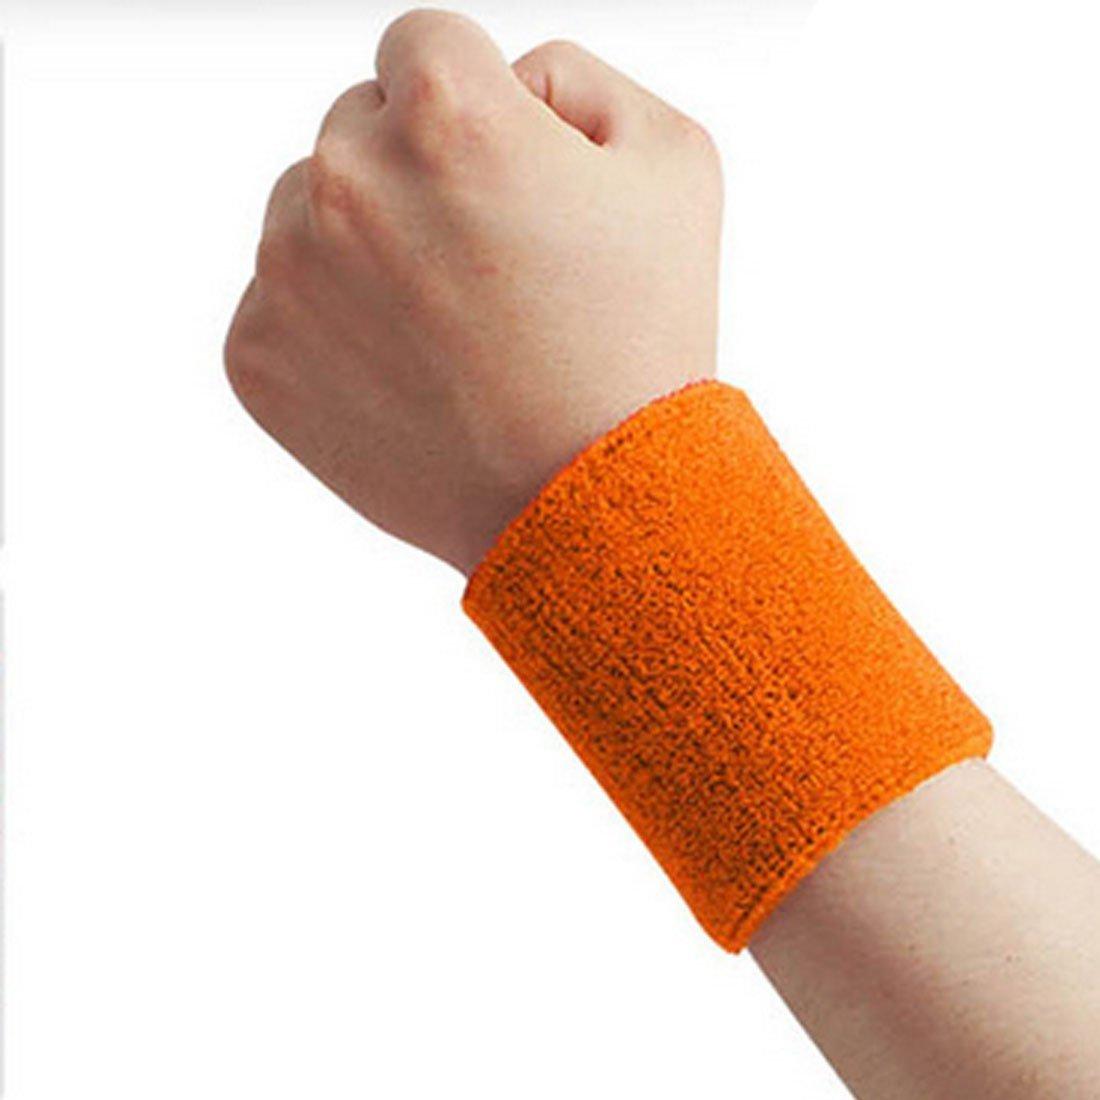 Hommes Femmes Sport Sweatband Tennis Squash Badminton /éponge poignet Sweat Bands Basketball Gym Wristband Wrist Wraps